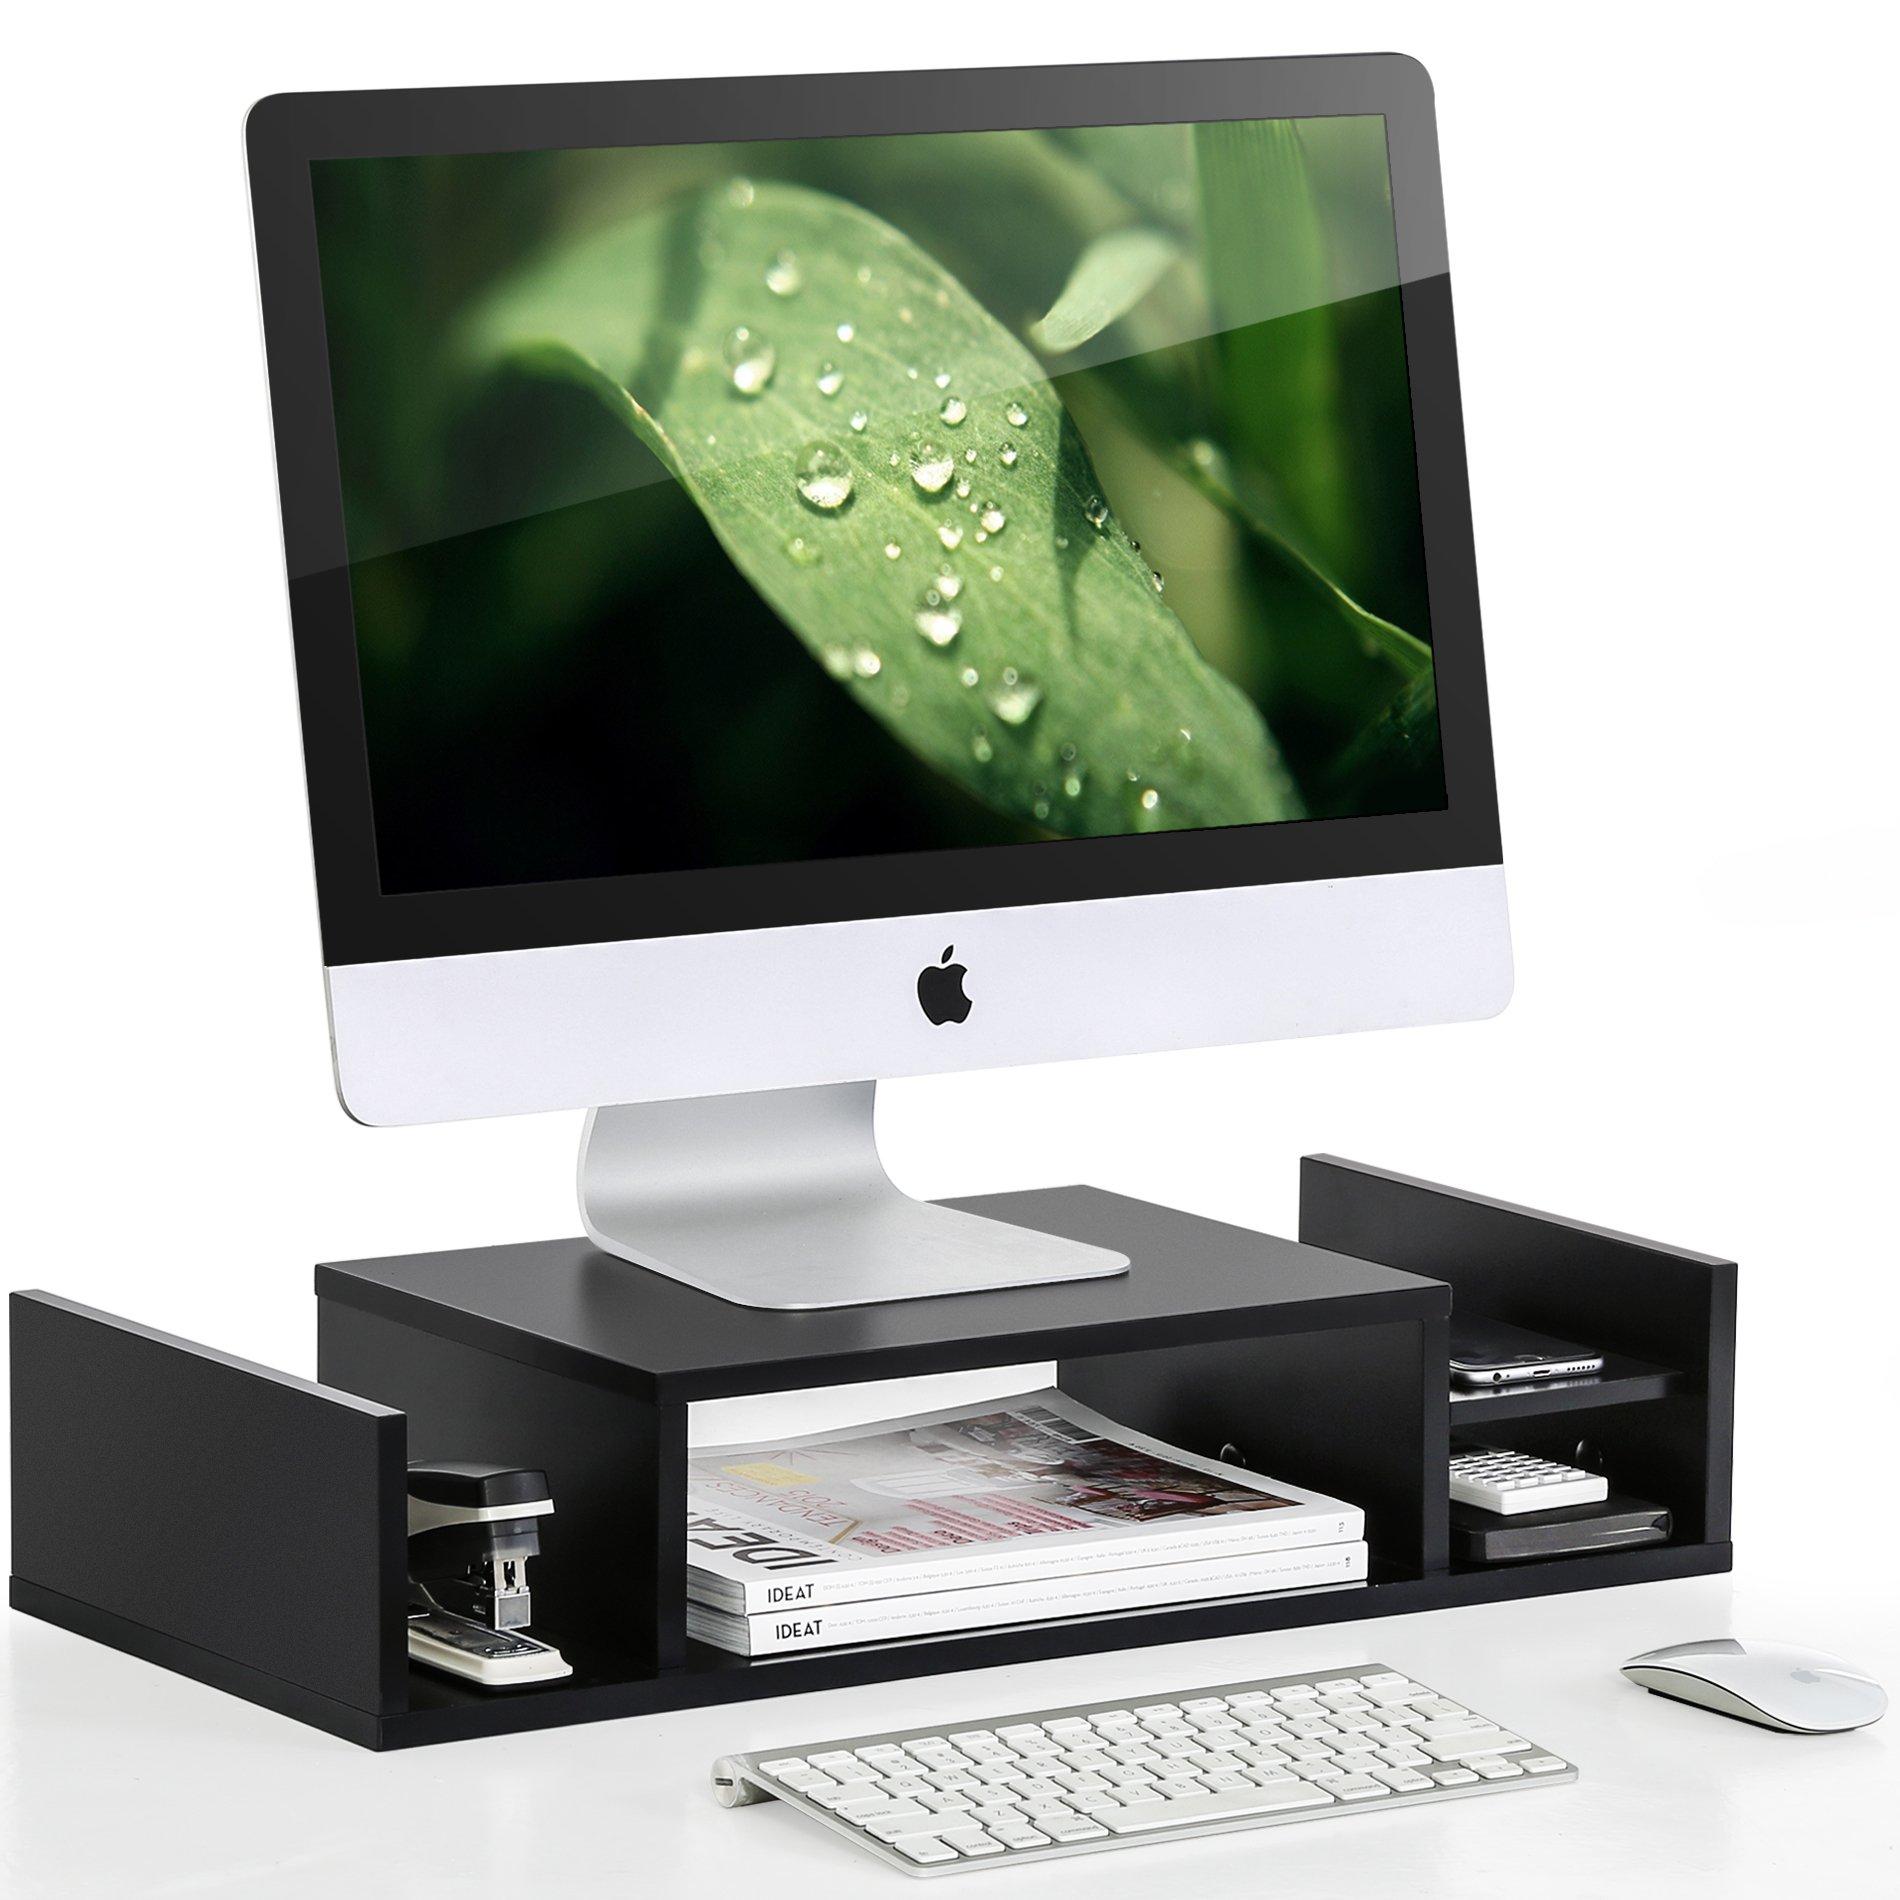 FITUEYES Wooden Adjustable Monitor Riser with Storage 2 Shelves Desktop Organizer DT306001WB